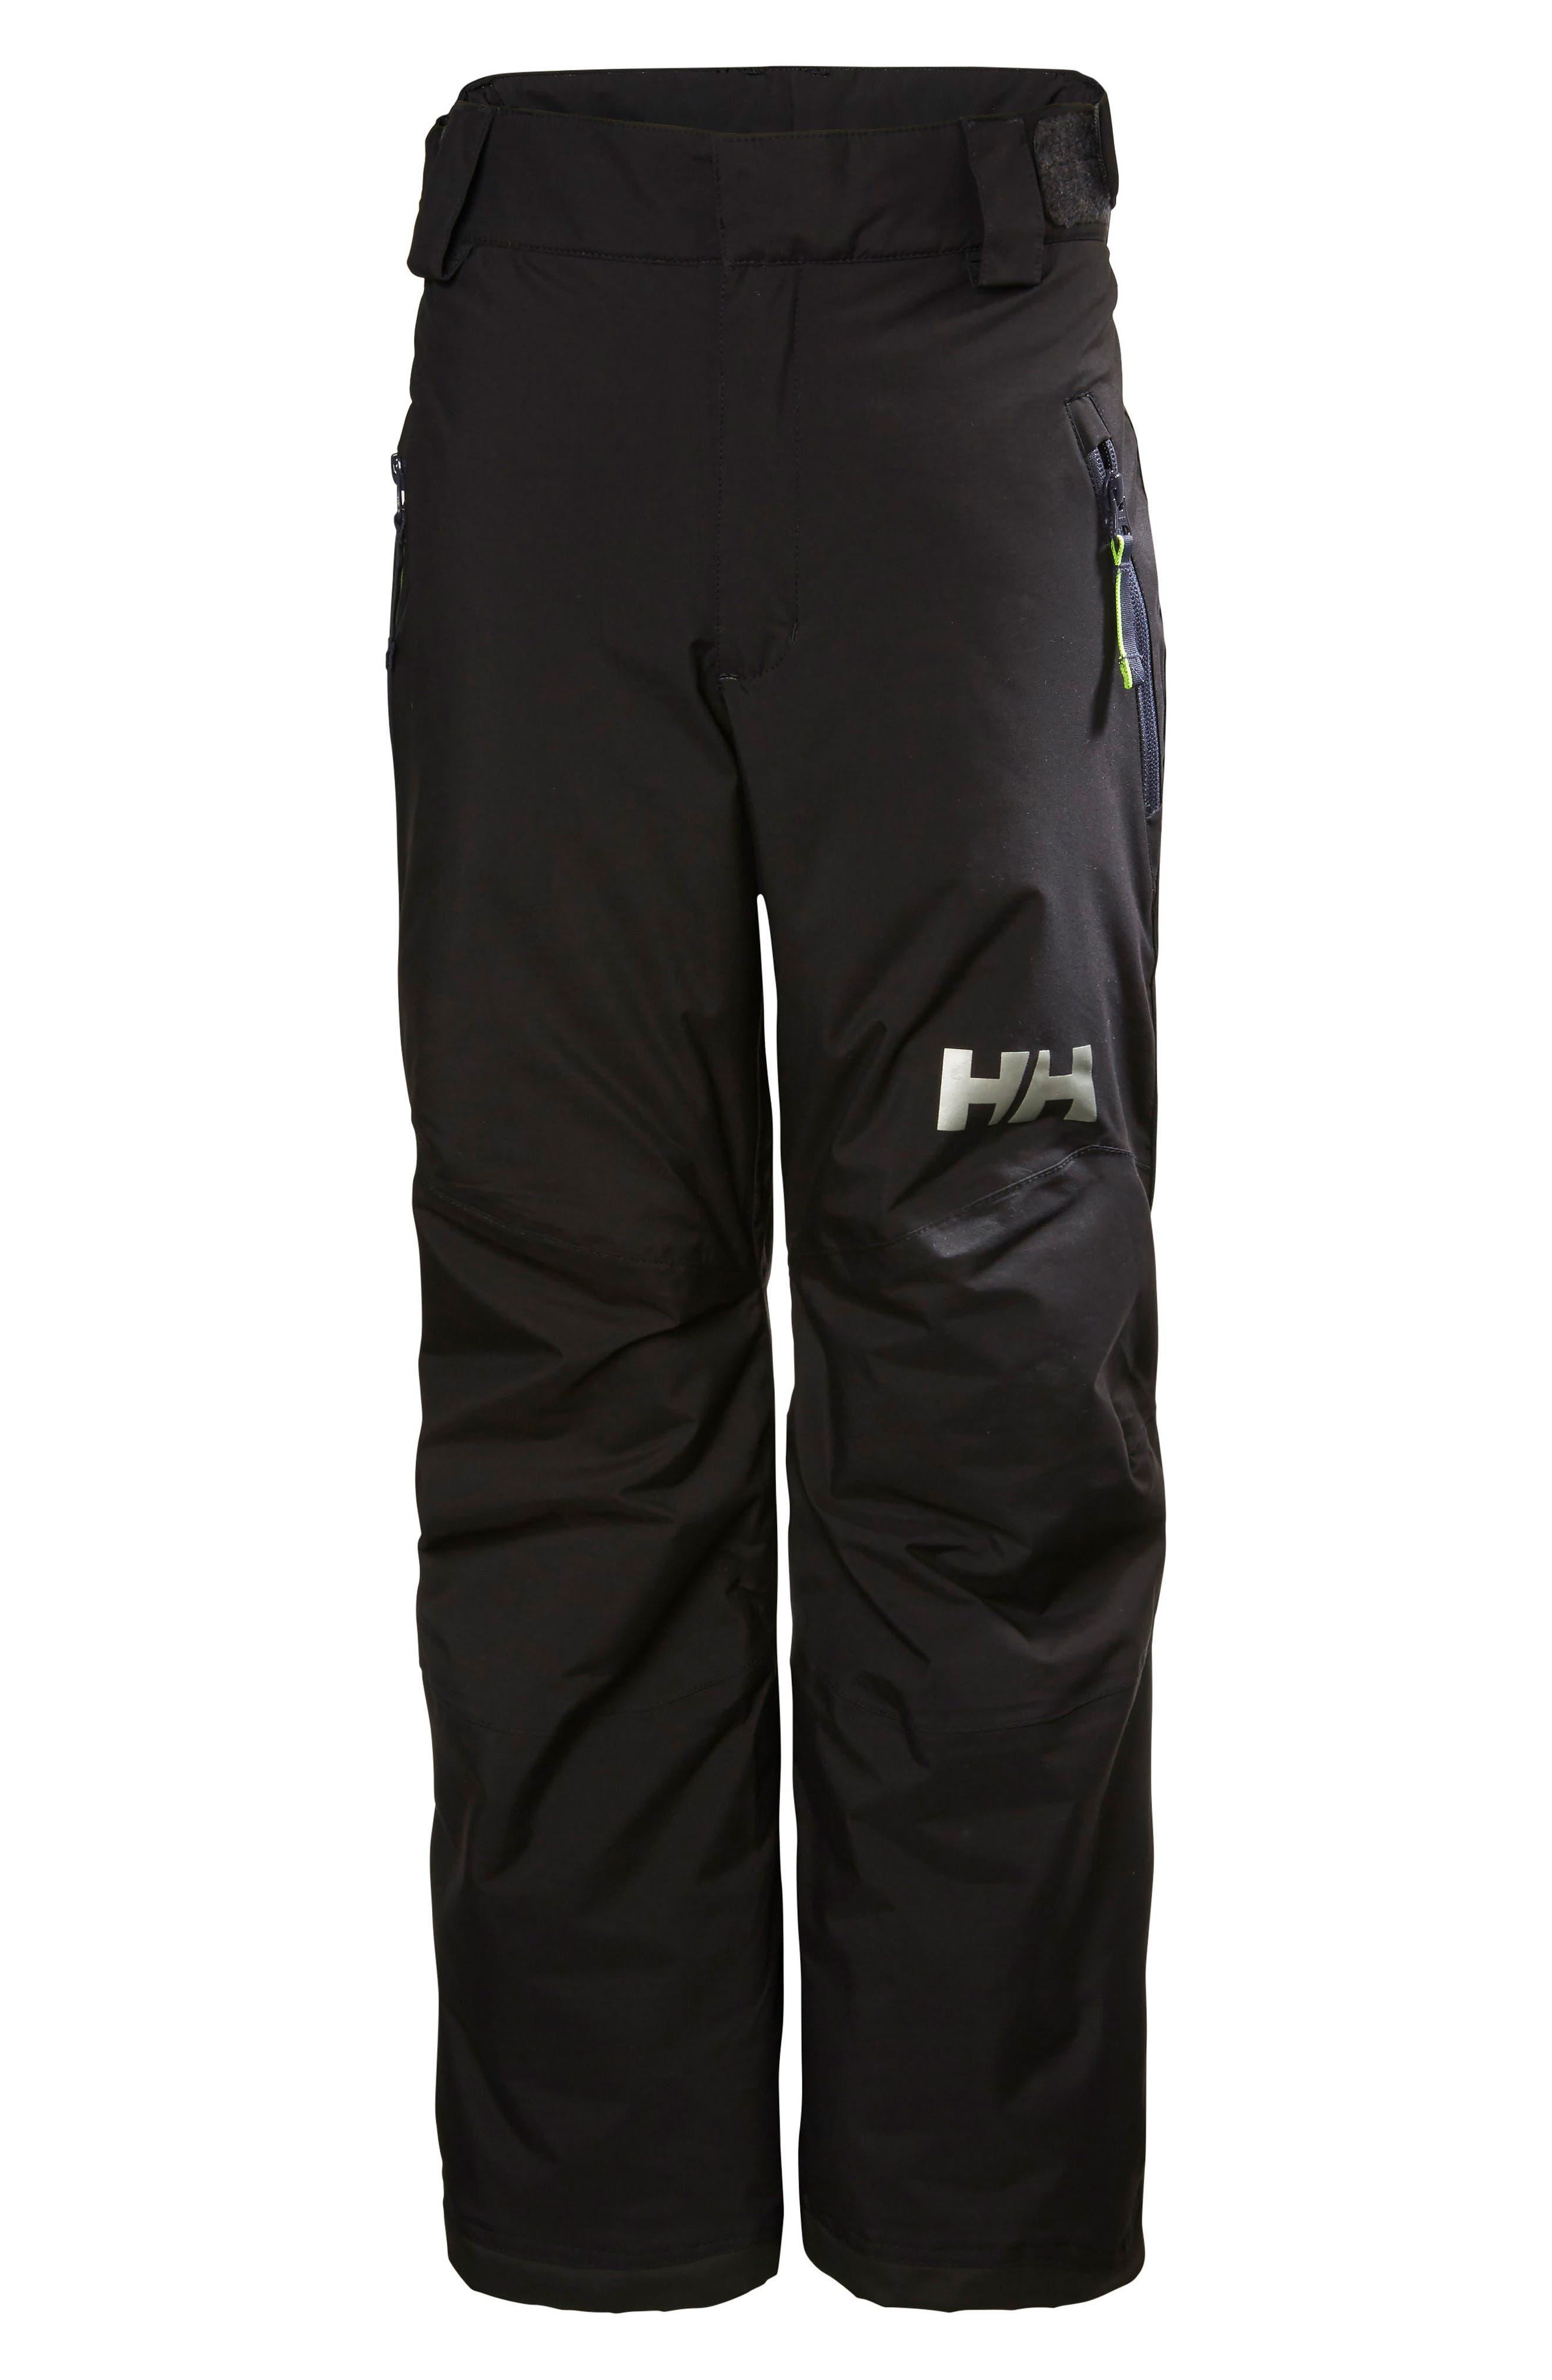 Helly Hansen Legendary Waterproof PrimaLoft® Insulated Snow Pants (Big Boys)